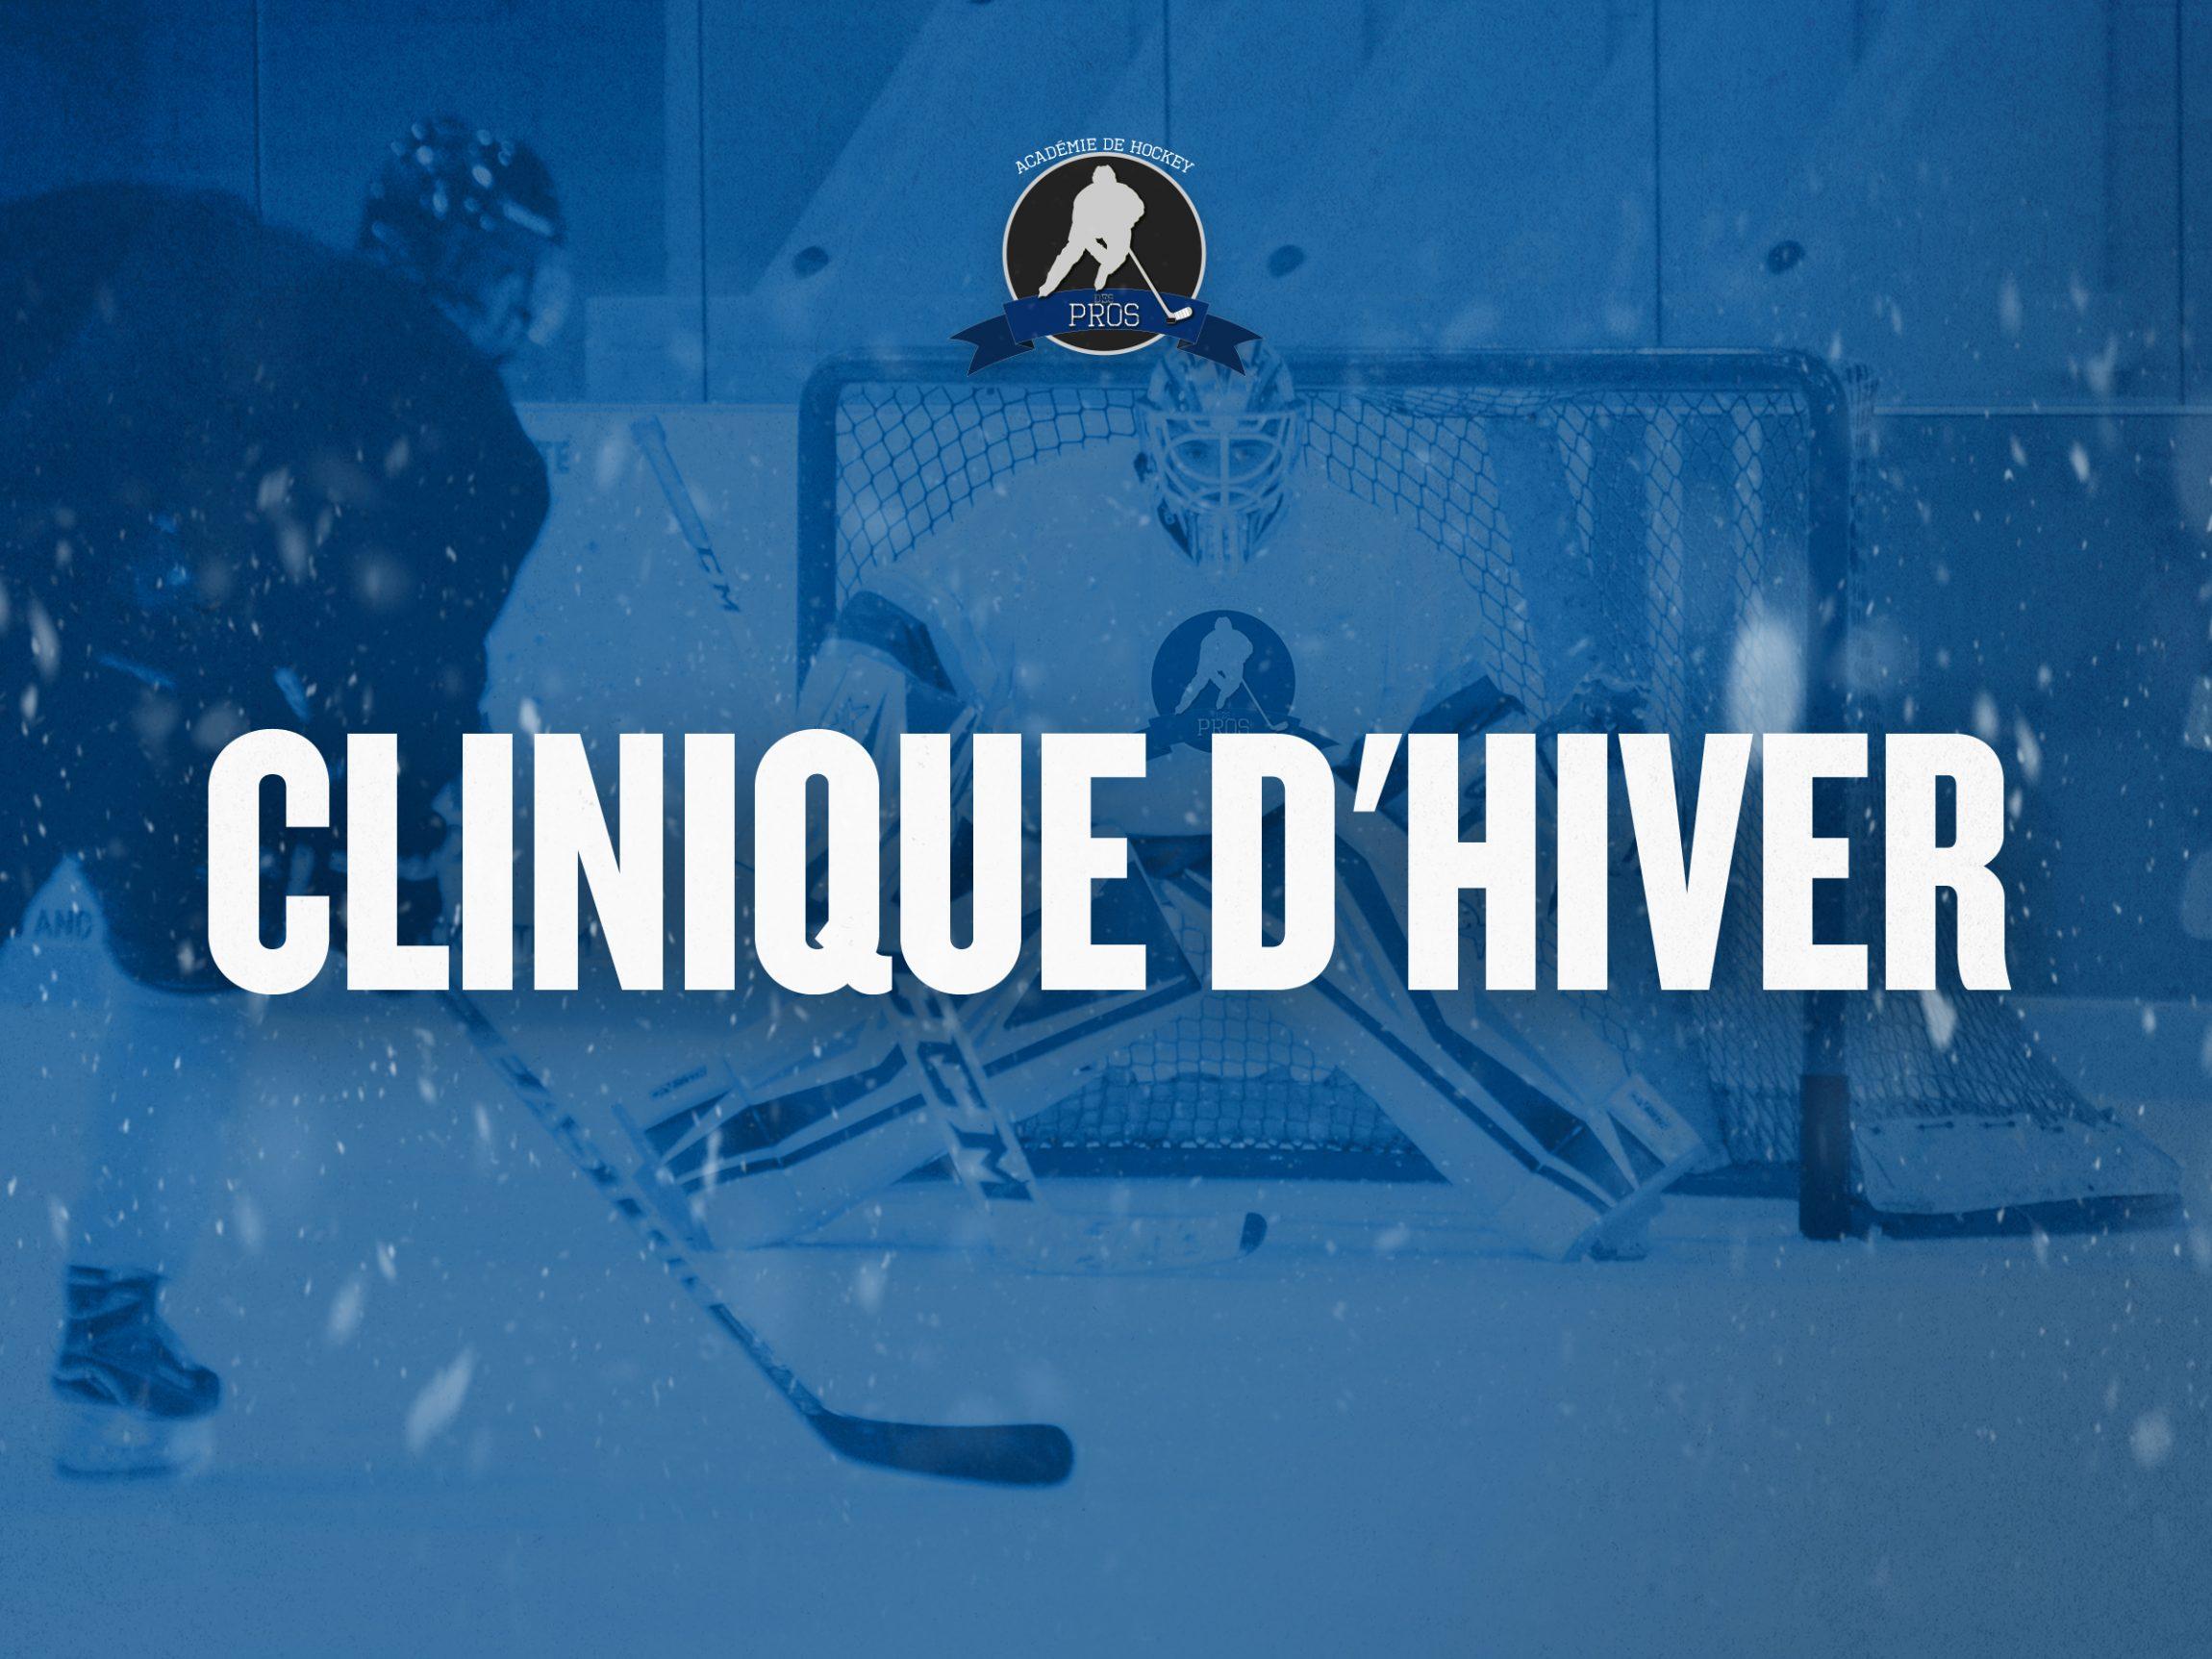 ADHP_clinique-hiver (1)